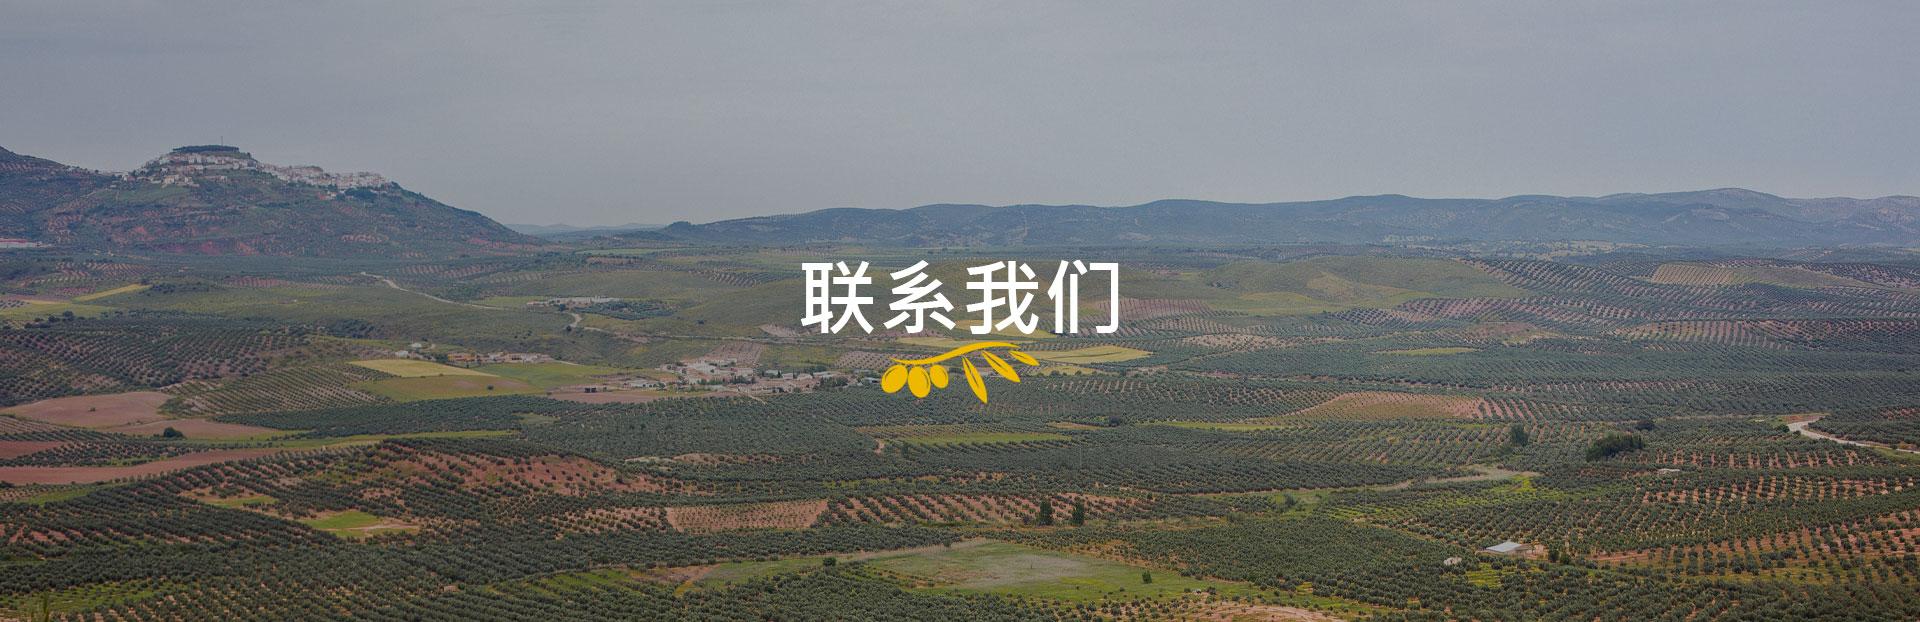 AceitesUnicos_slider_contacto_chino